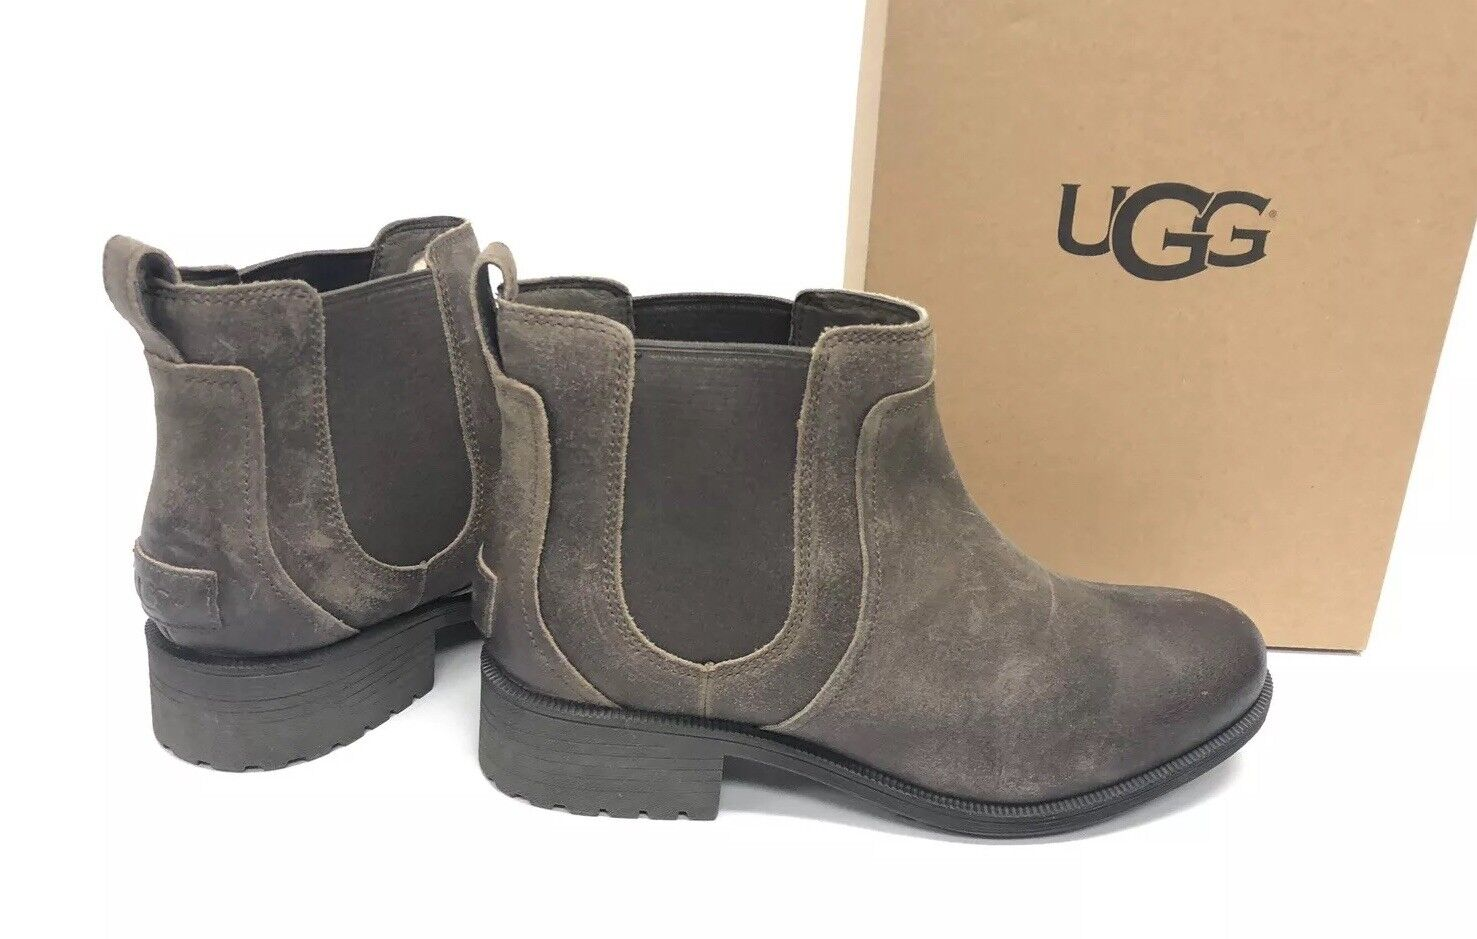 854a5e44295 NWB UGG Australia Bonham II Water Resistant Leather BOOTS in Dove Size 10